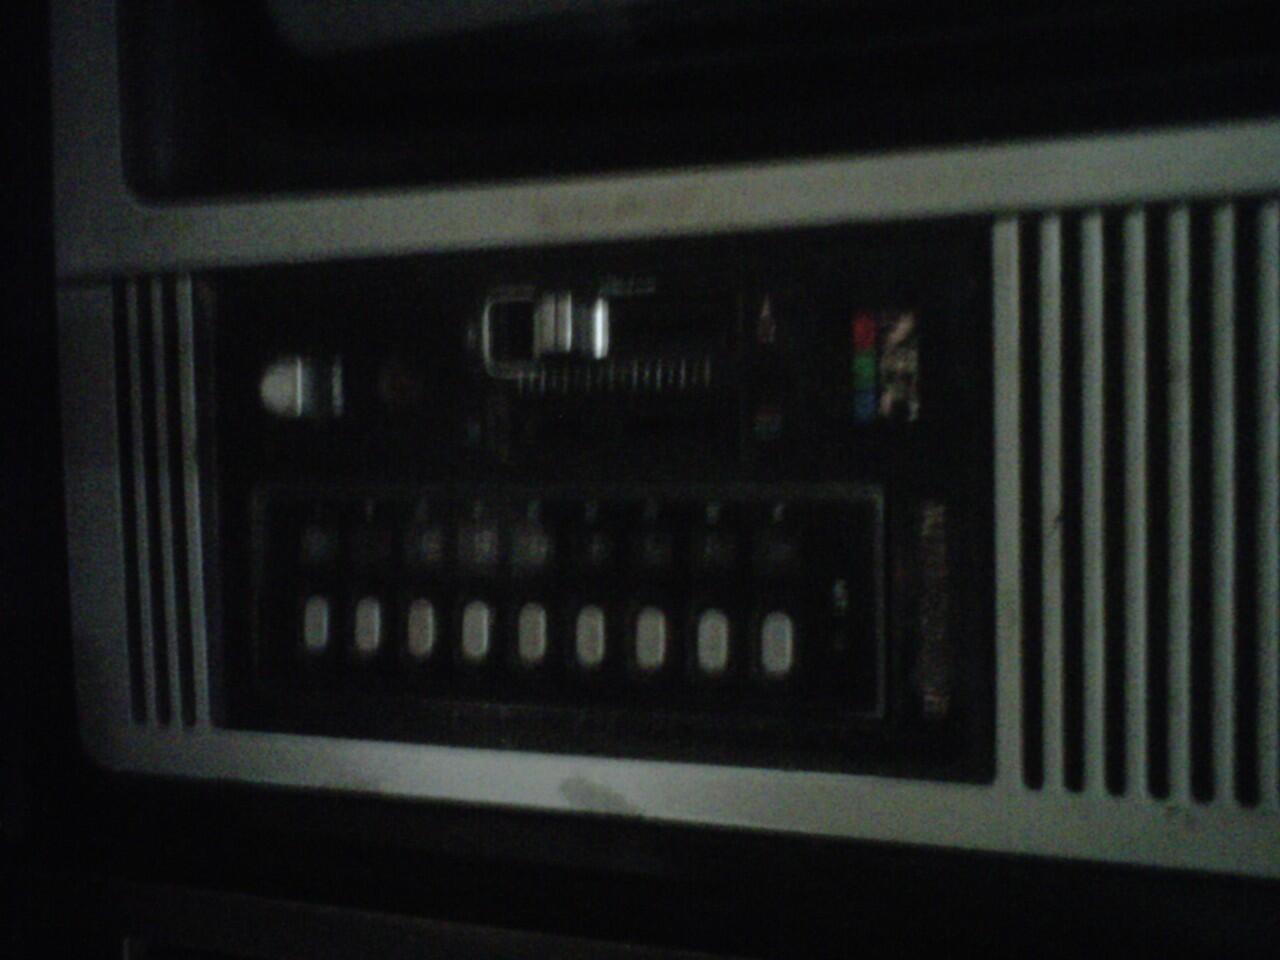 TV Antik merk NEC murah